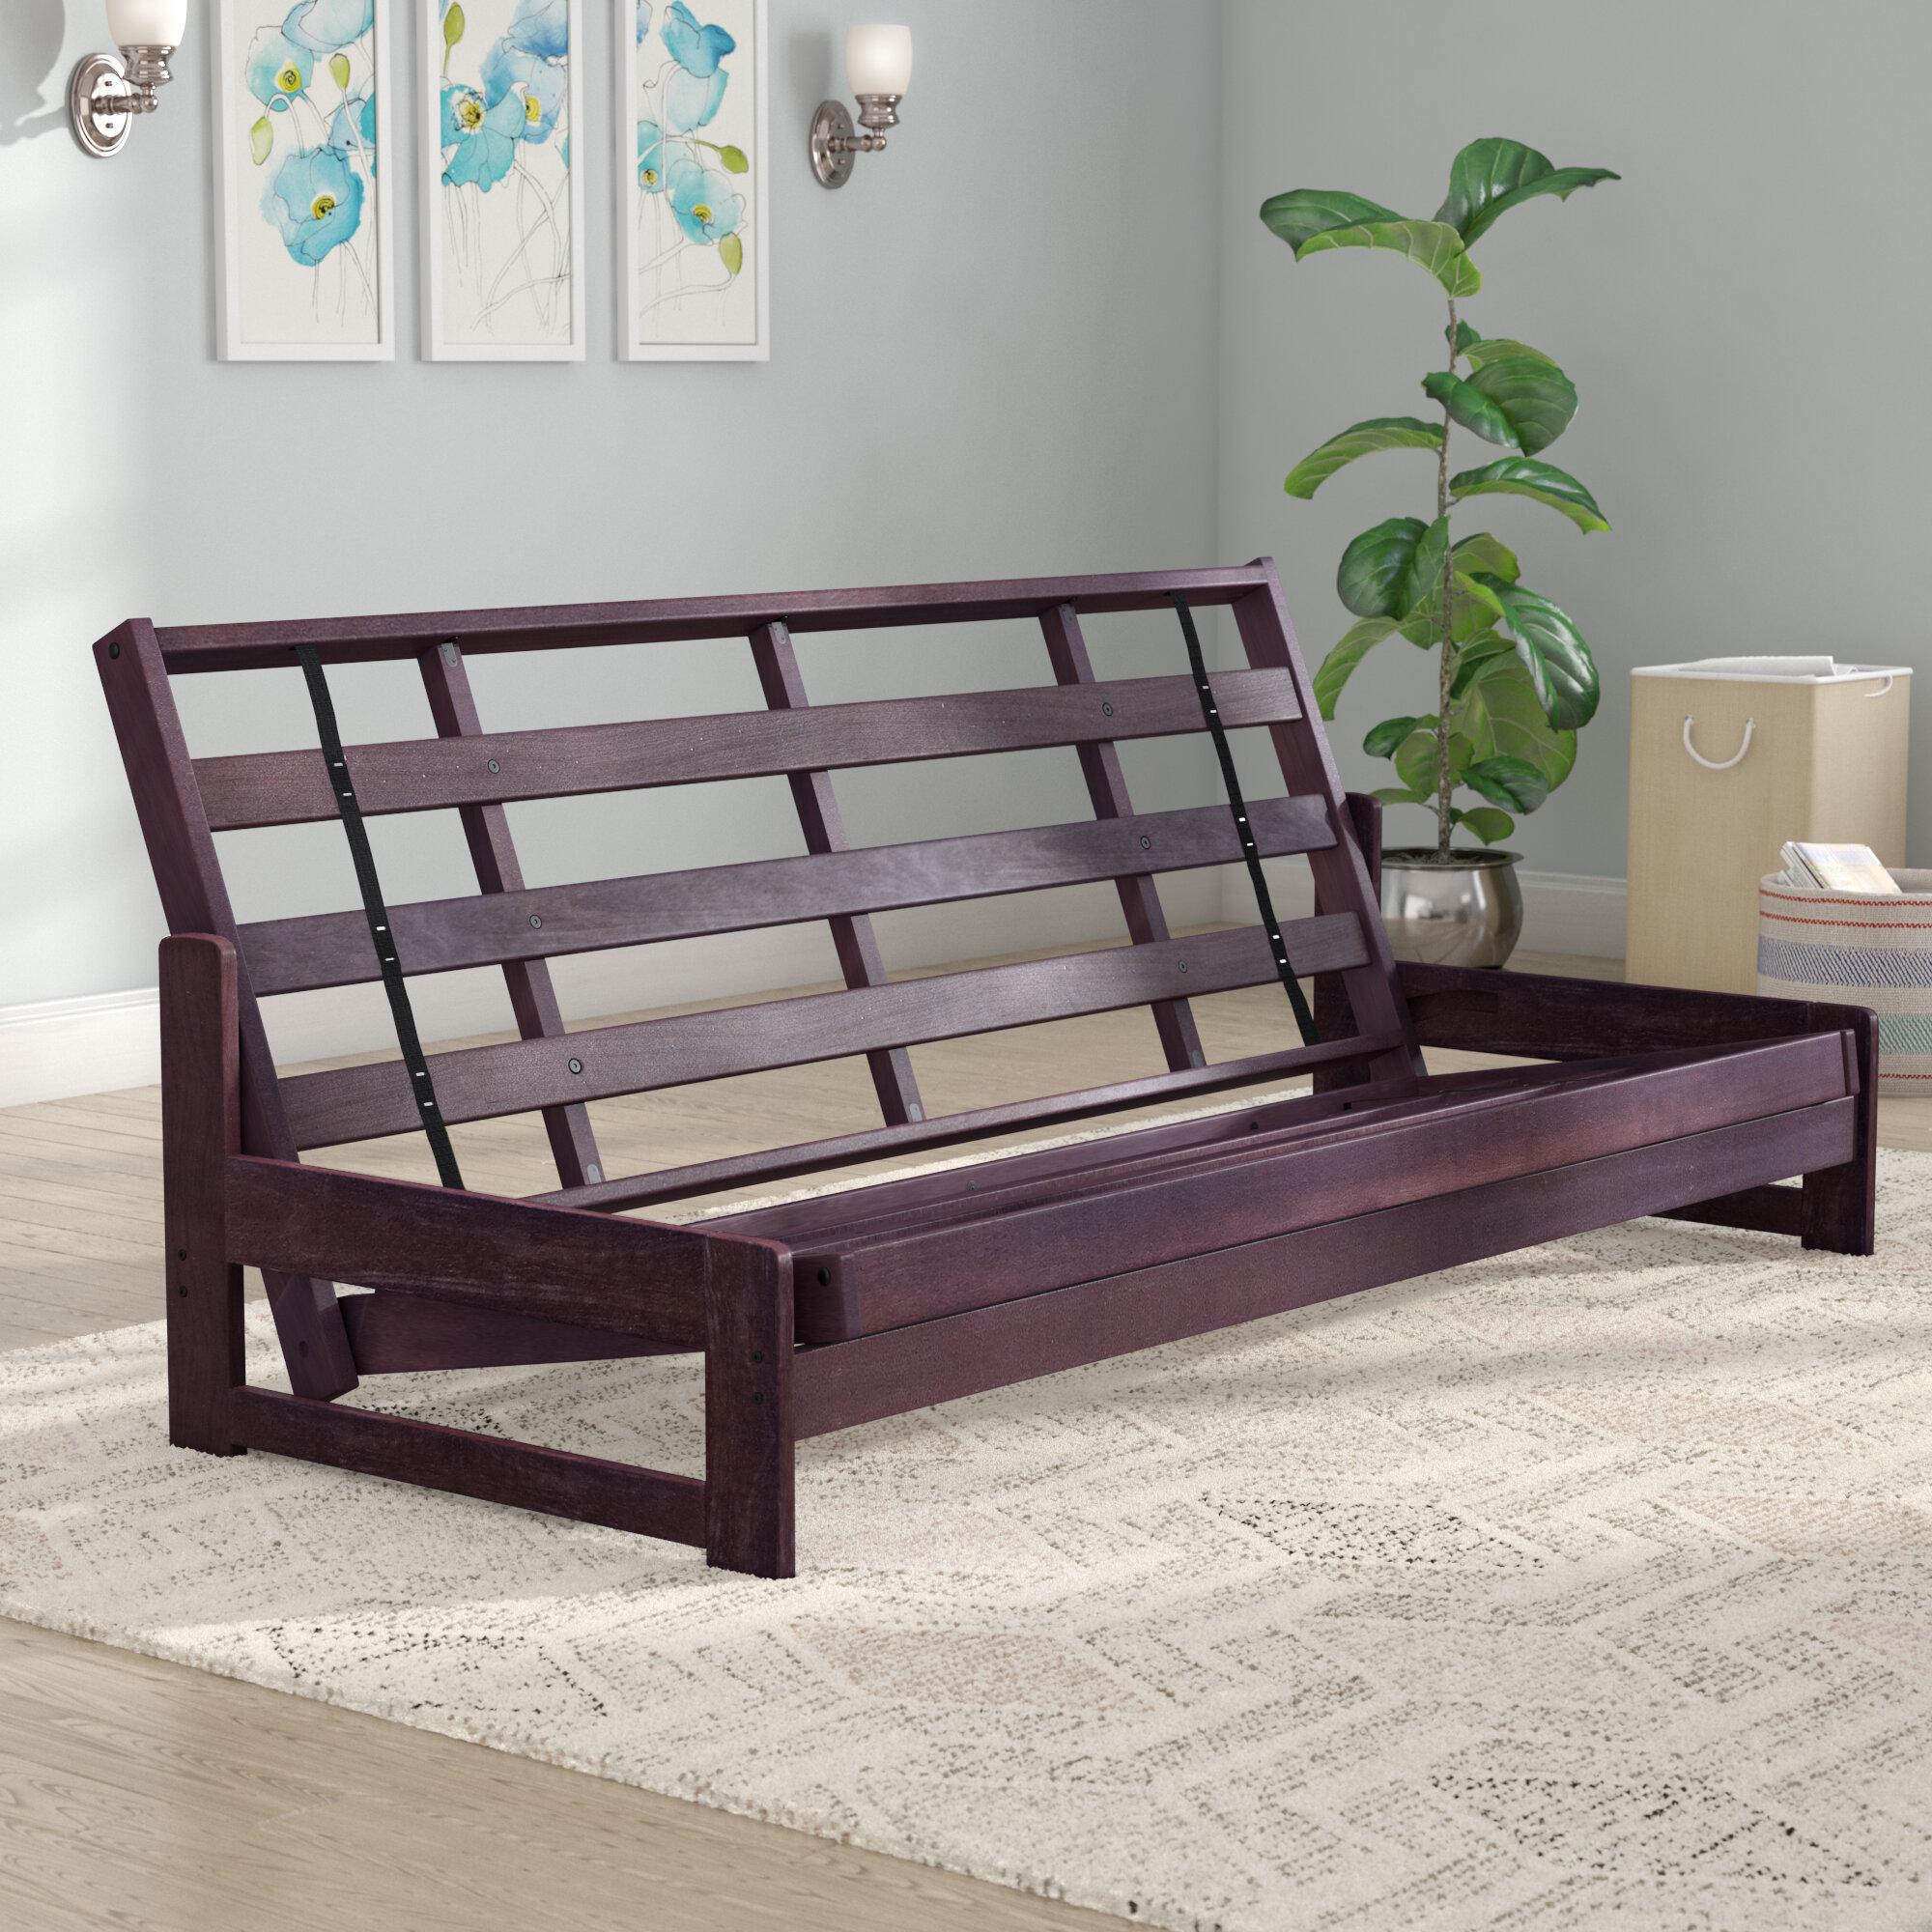 furniture wi mattress ideas futon nice best decor saving futons madison es mattresses